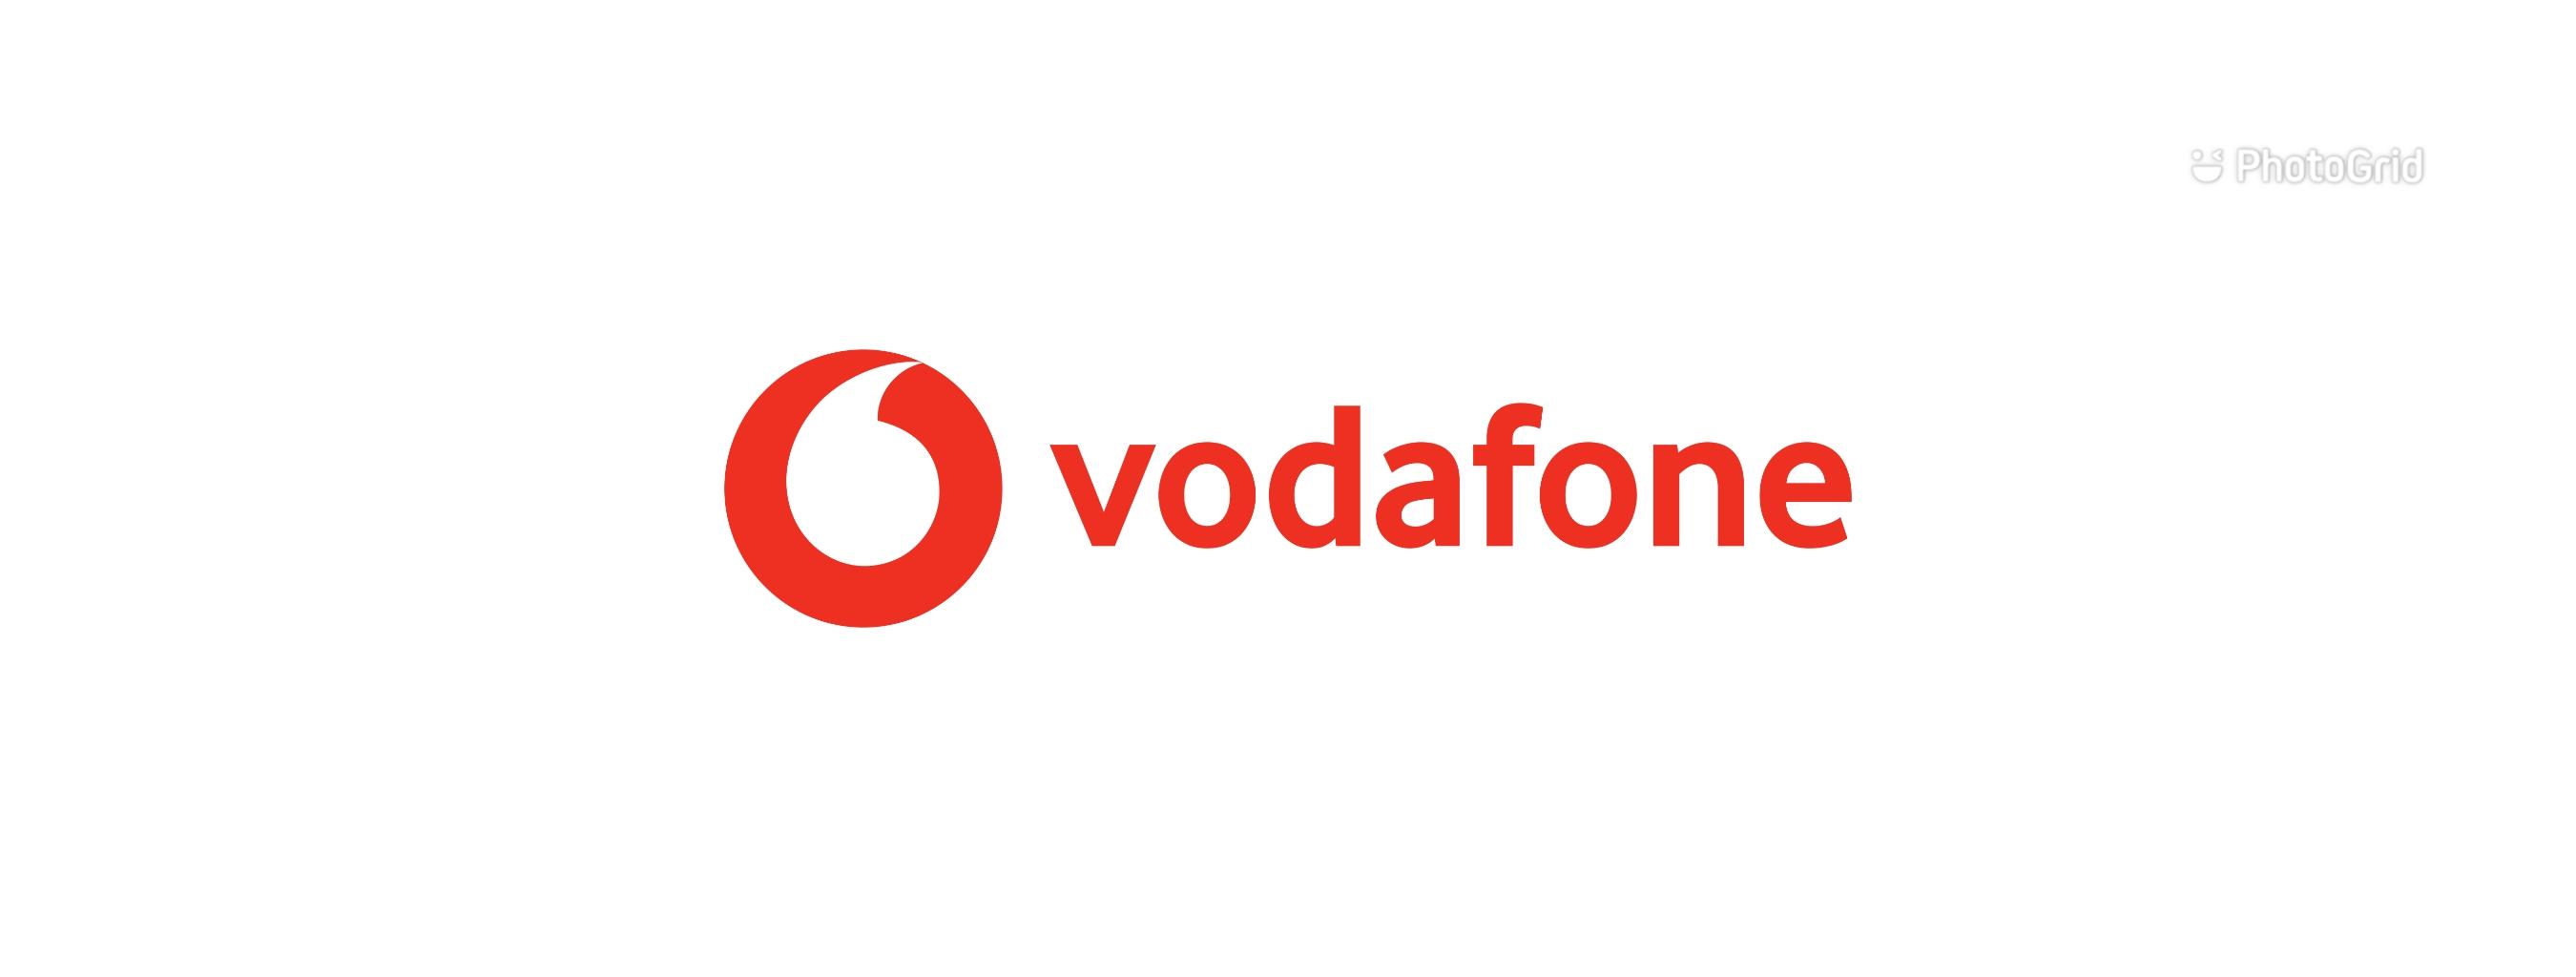 Vodafone Ghana logo 2021-2022